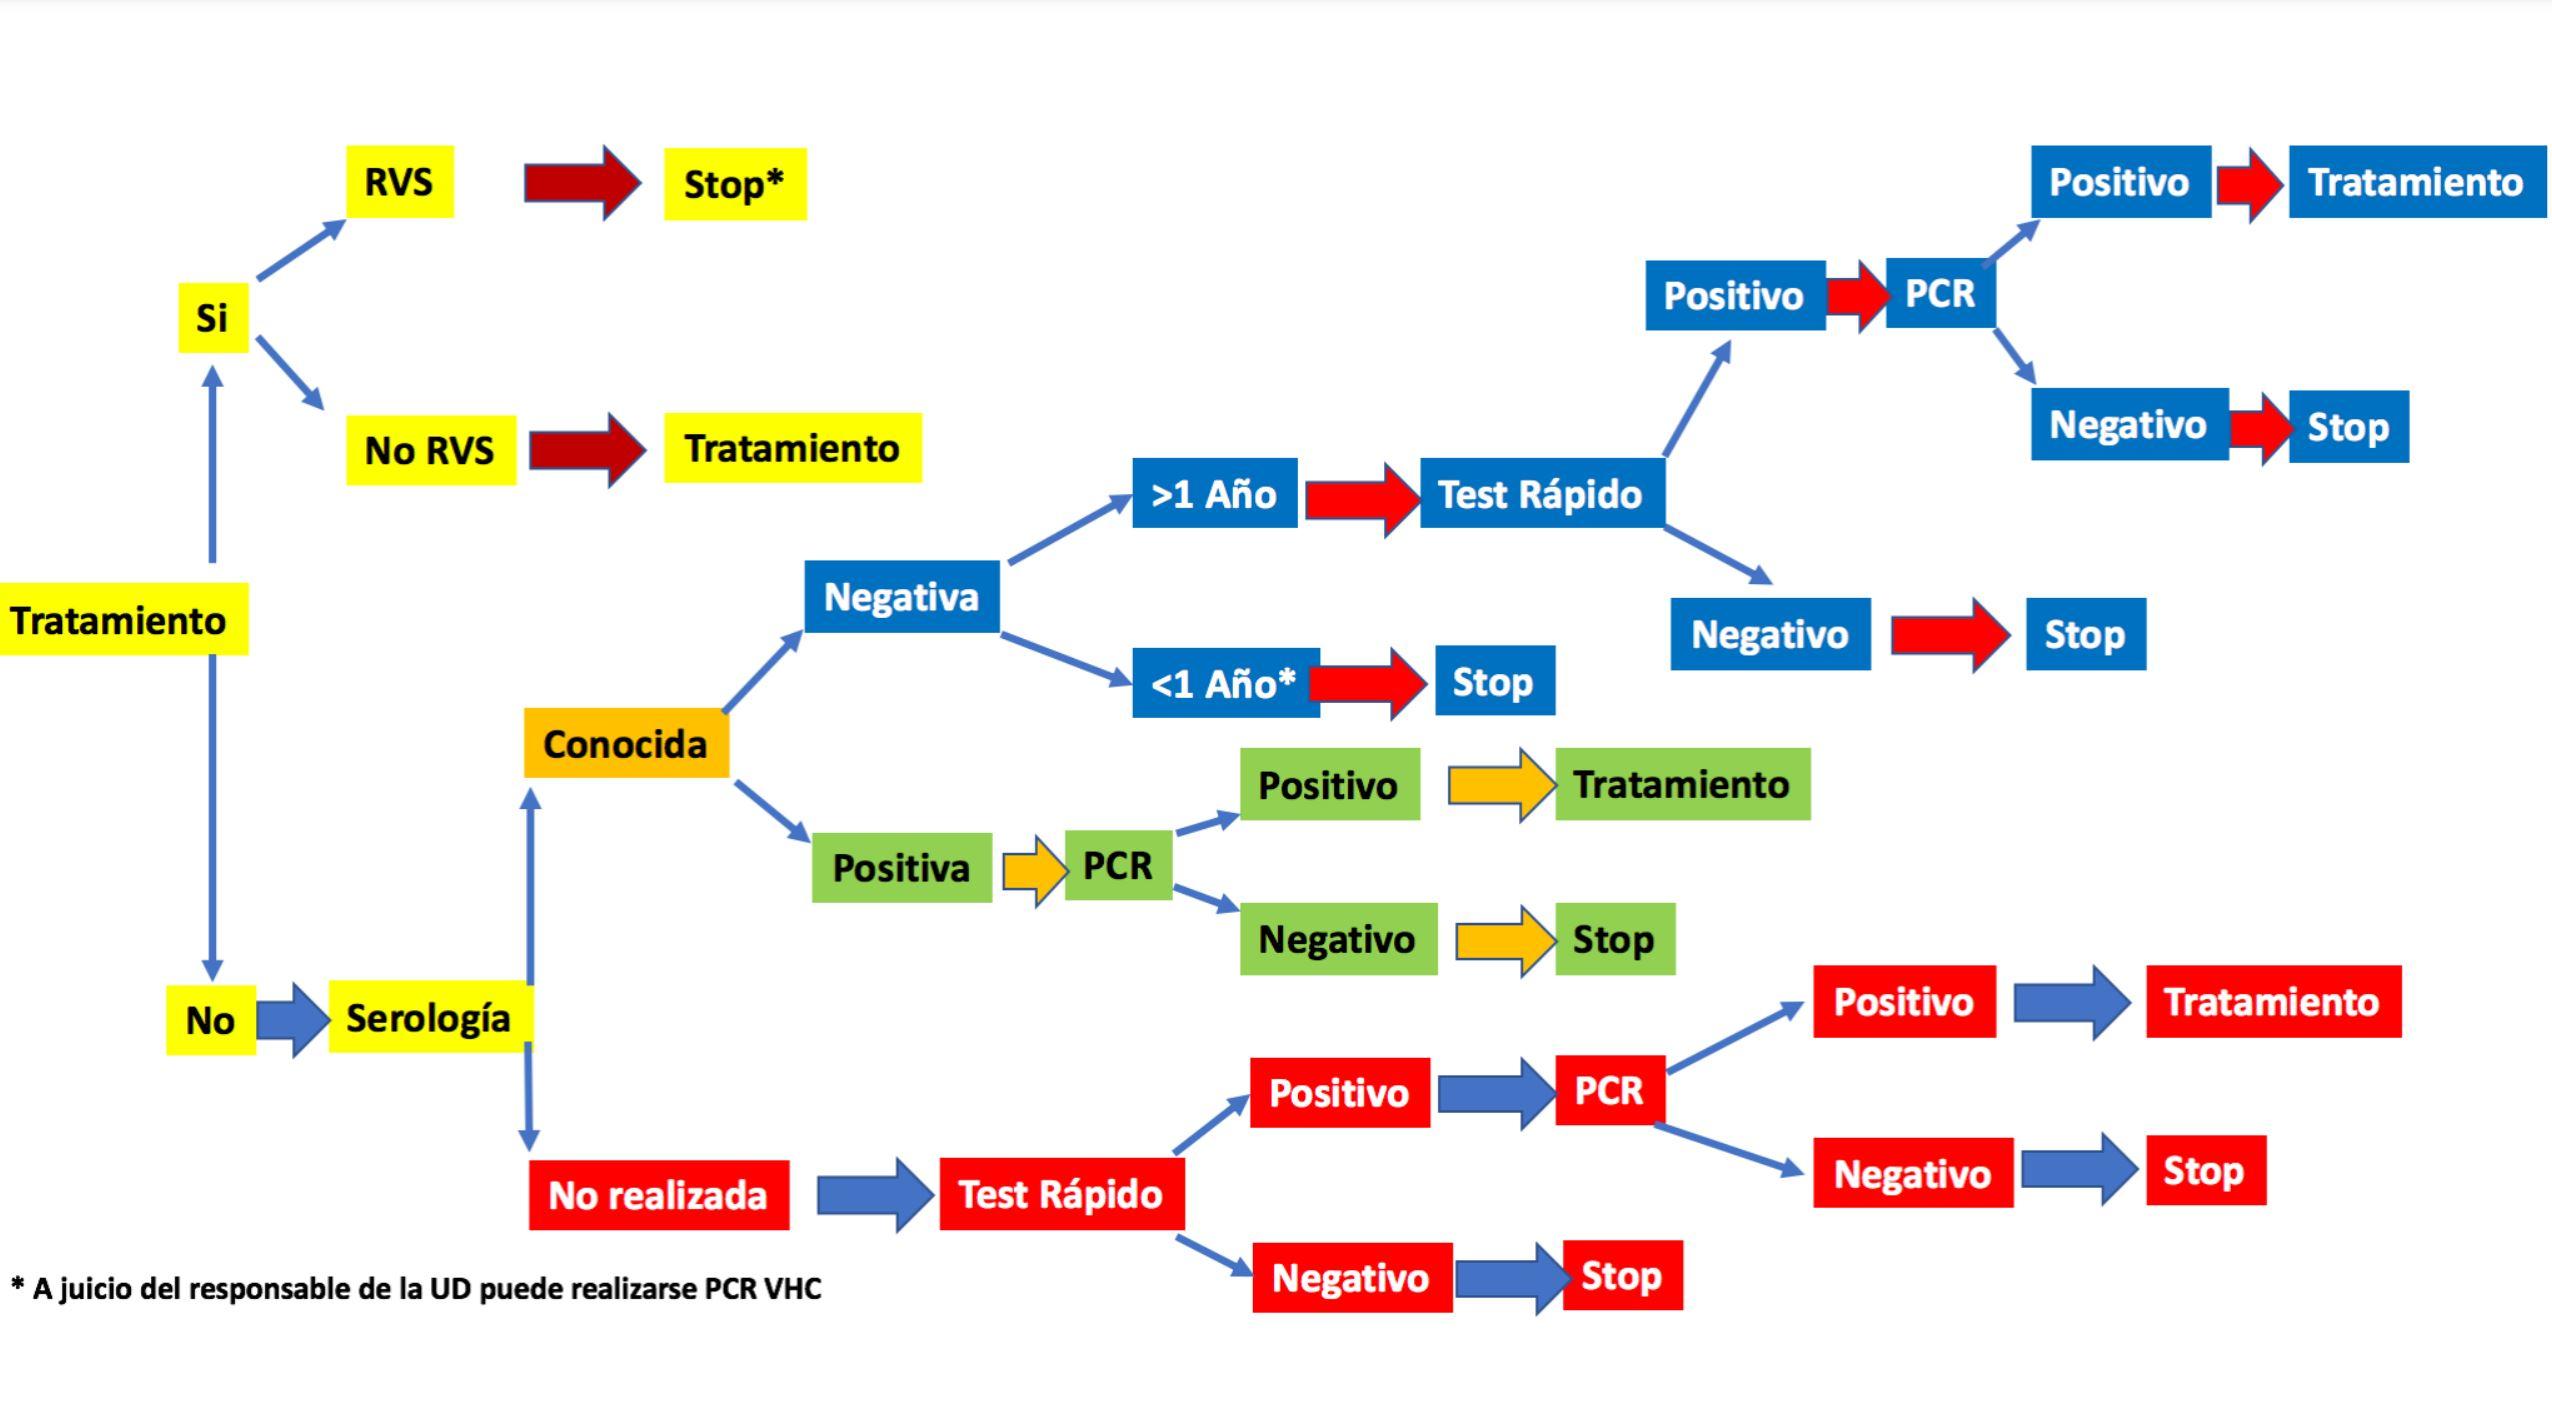 Algoritmo de cribado de Hepatitis C